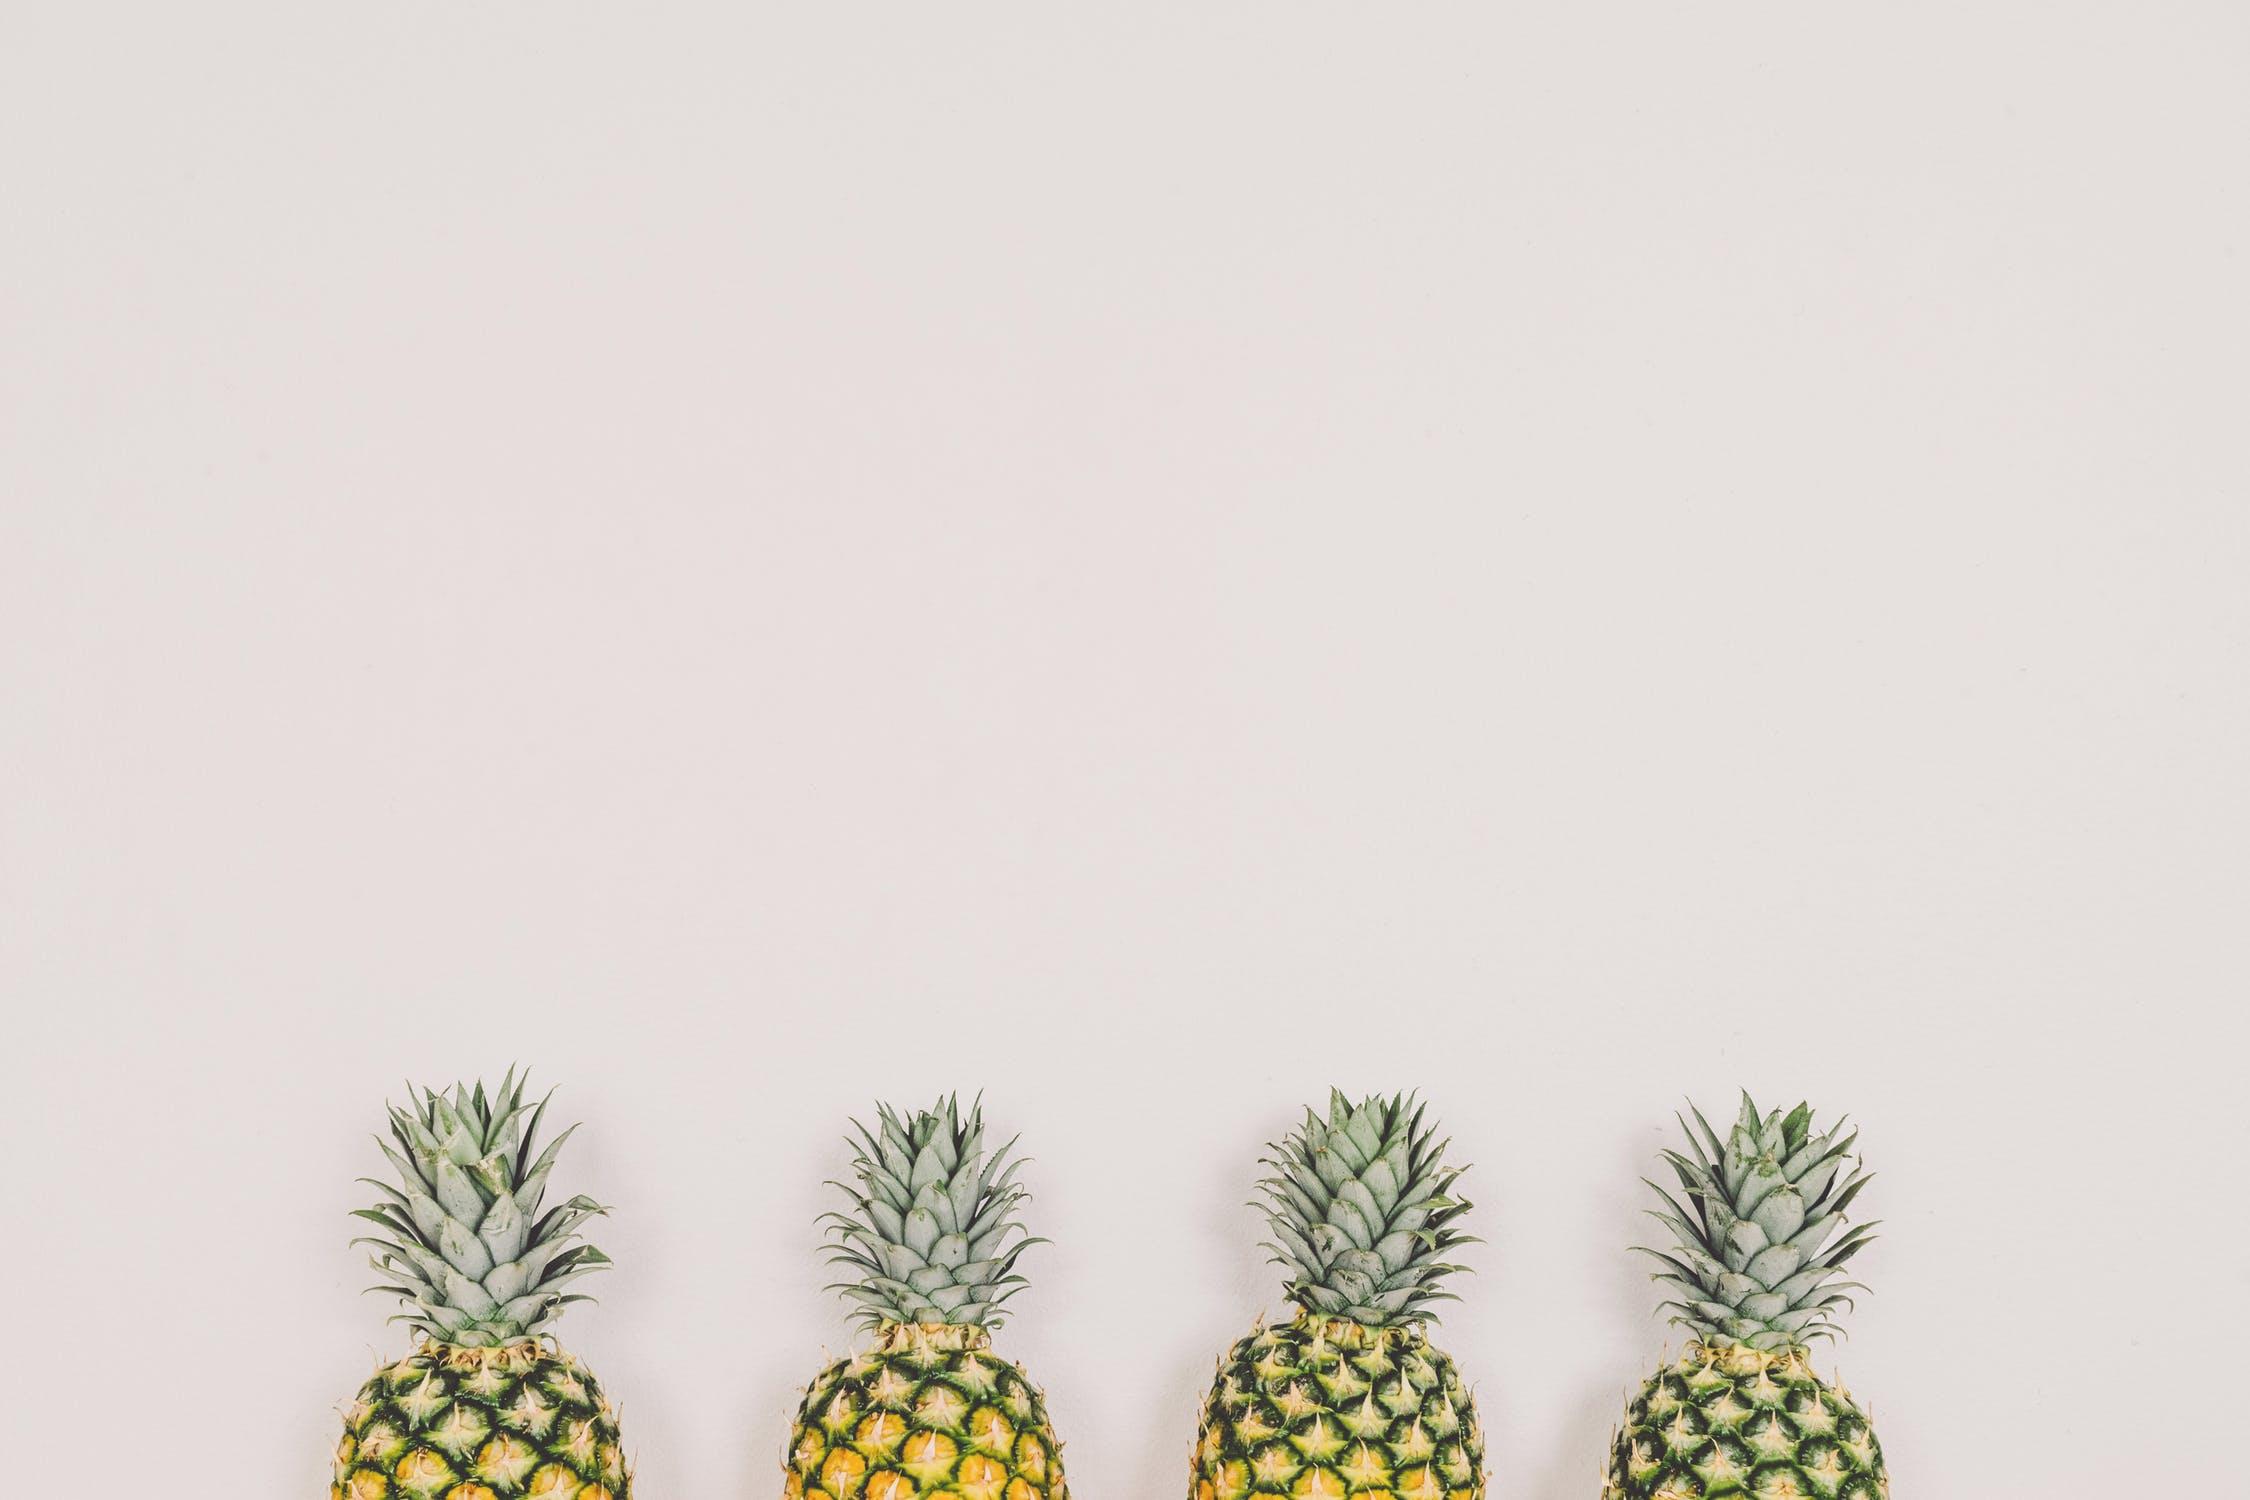 Cum iti dai seama daca ananasul este copt